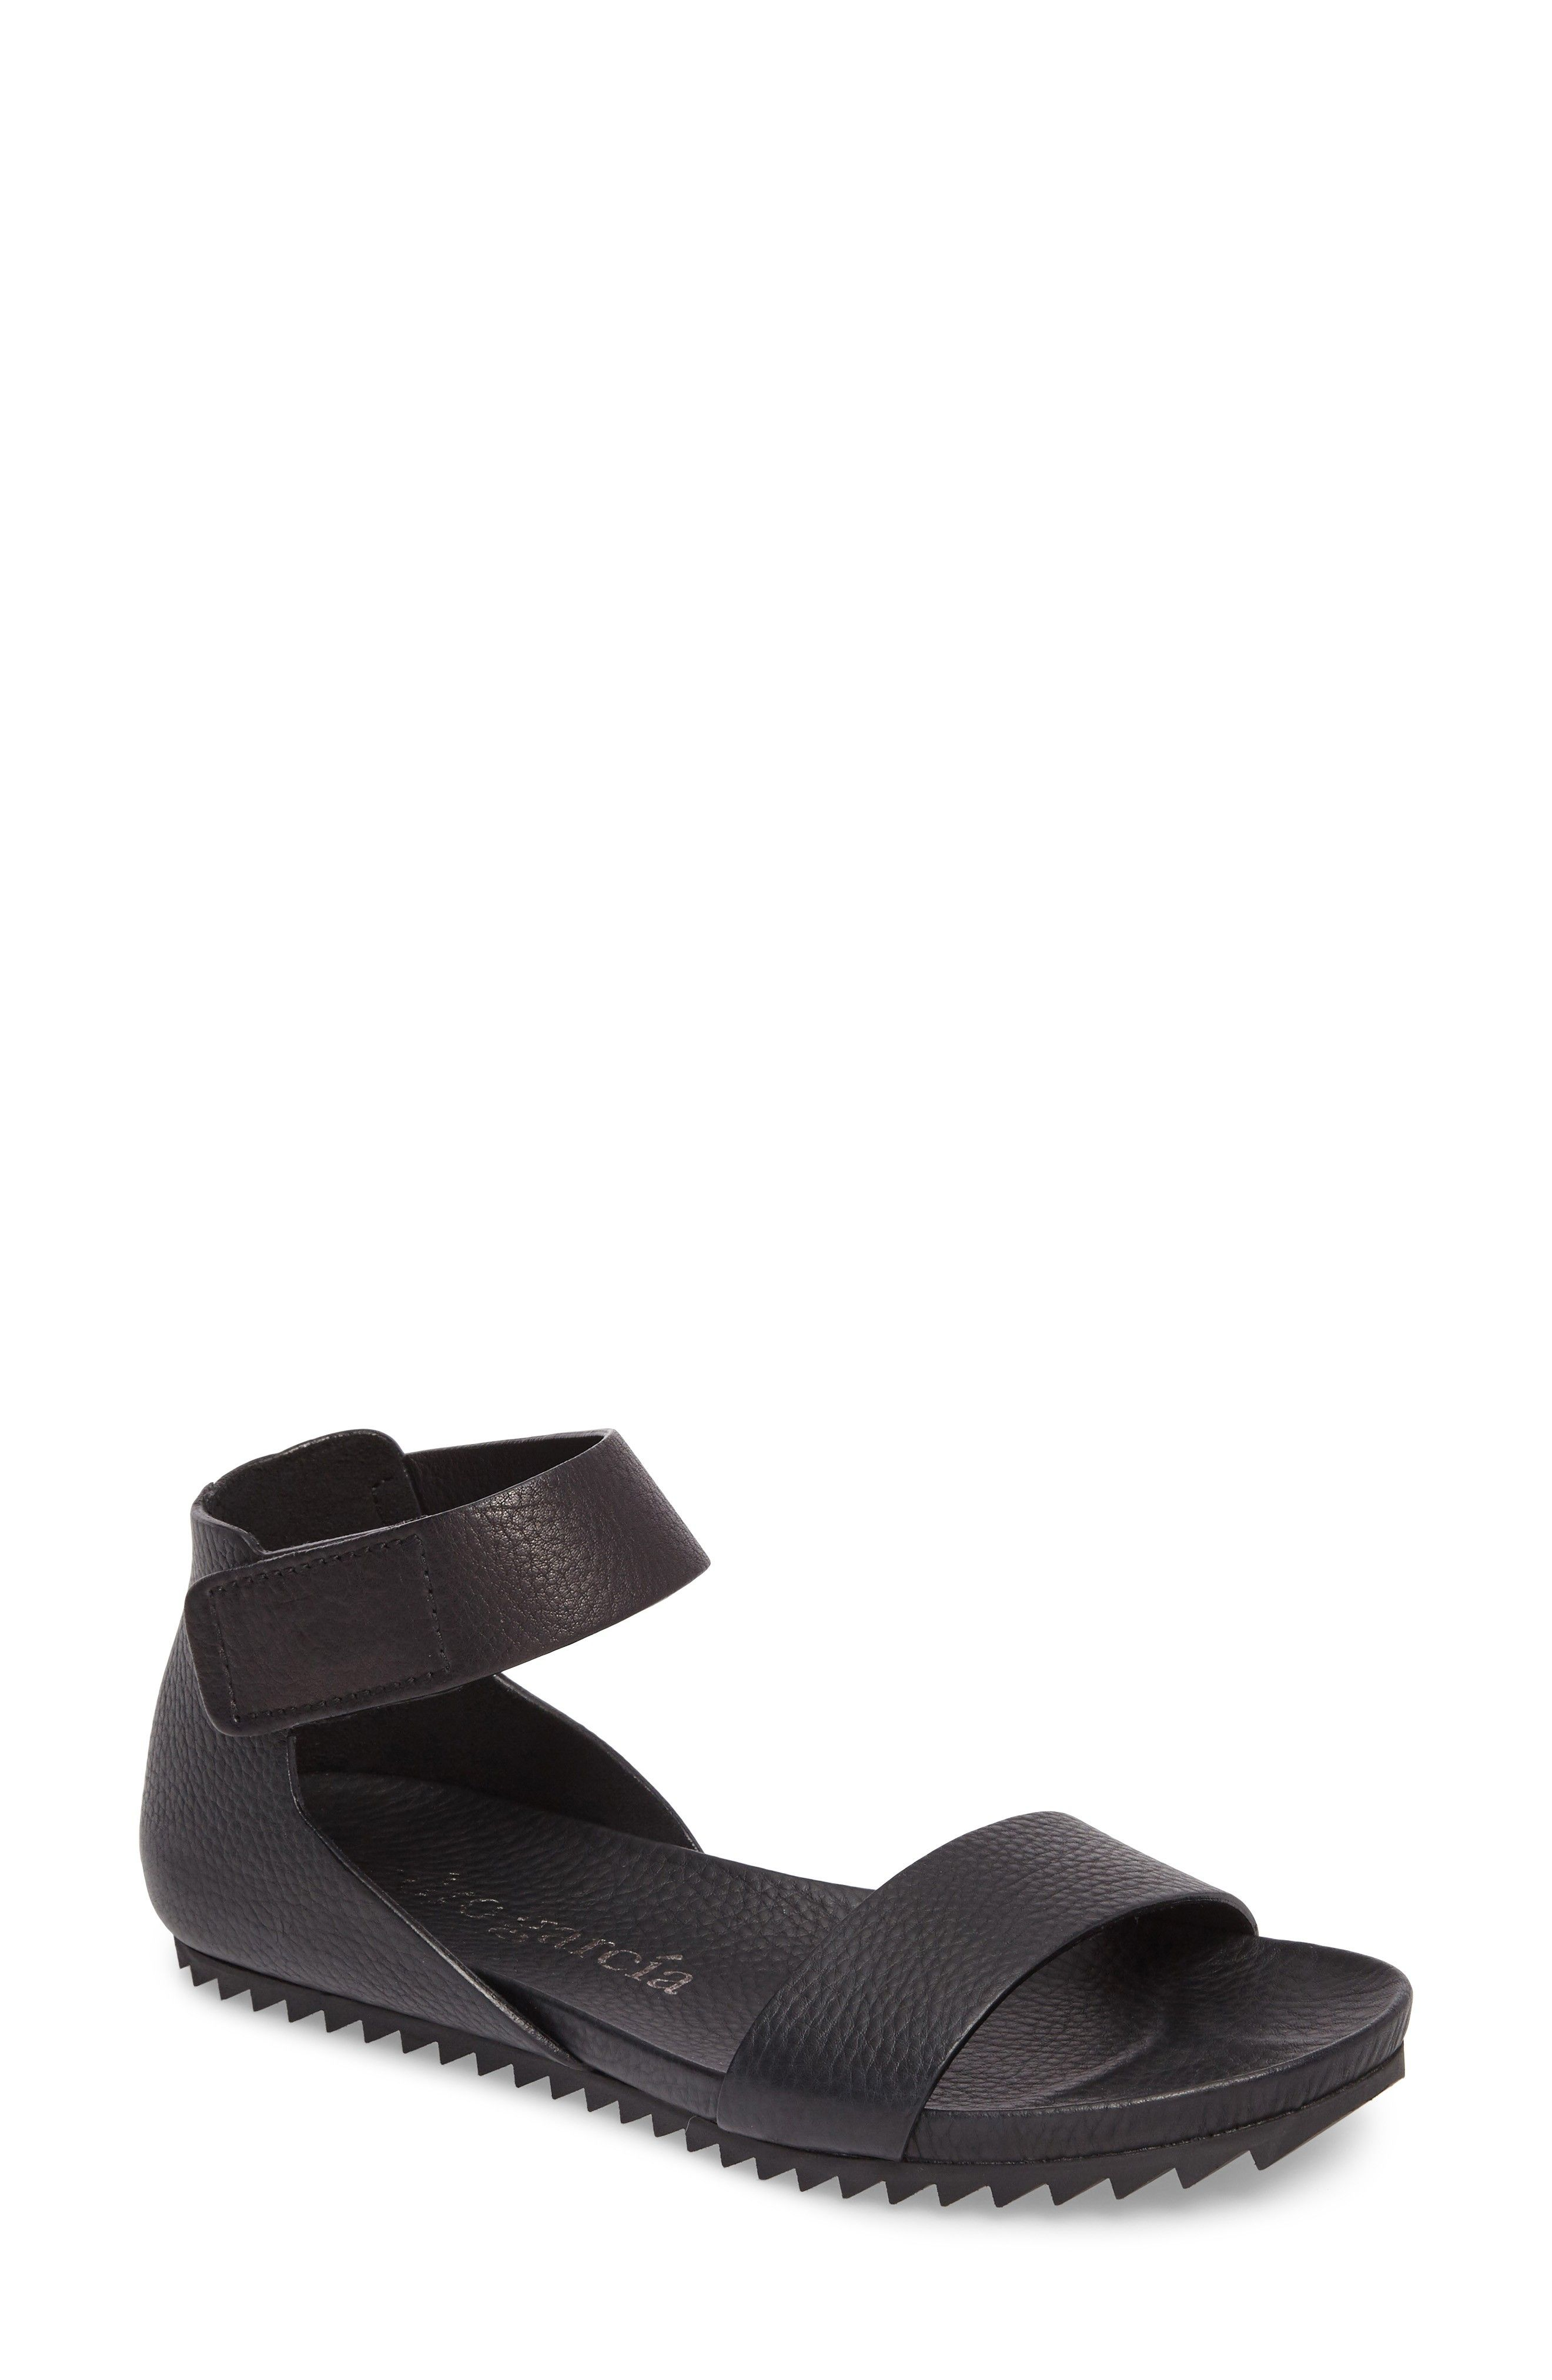 Pedro Garcia Women's Jalila Ankle Strap Sandal Zl4Hu